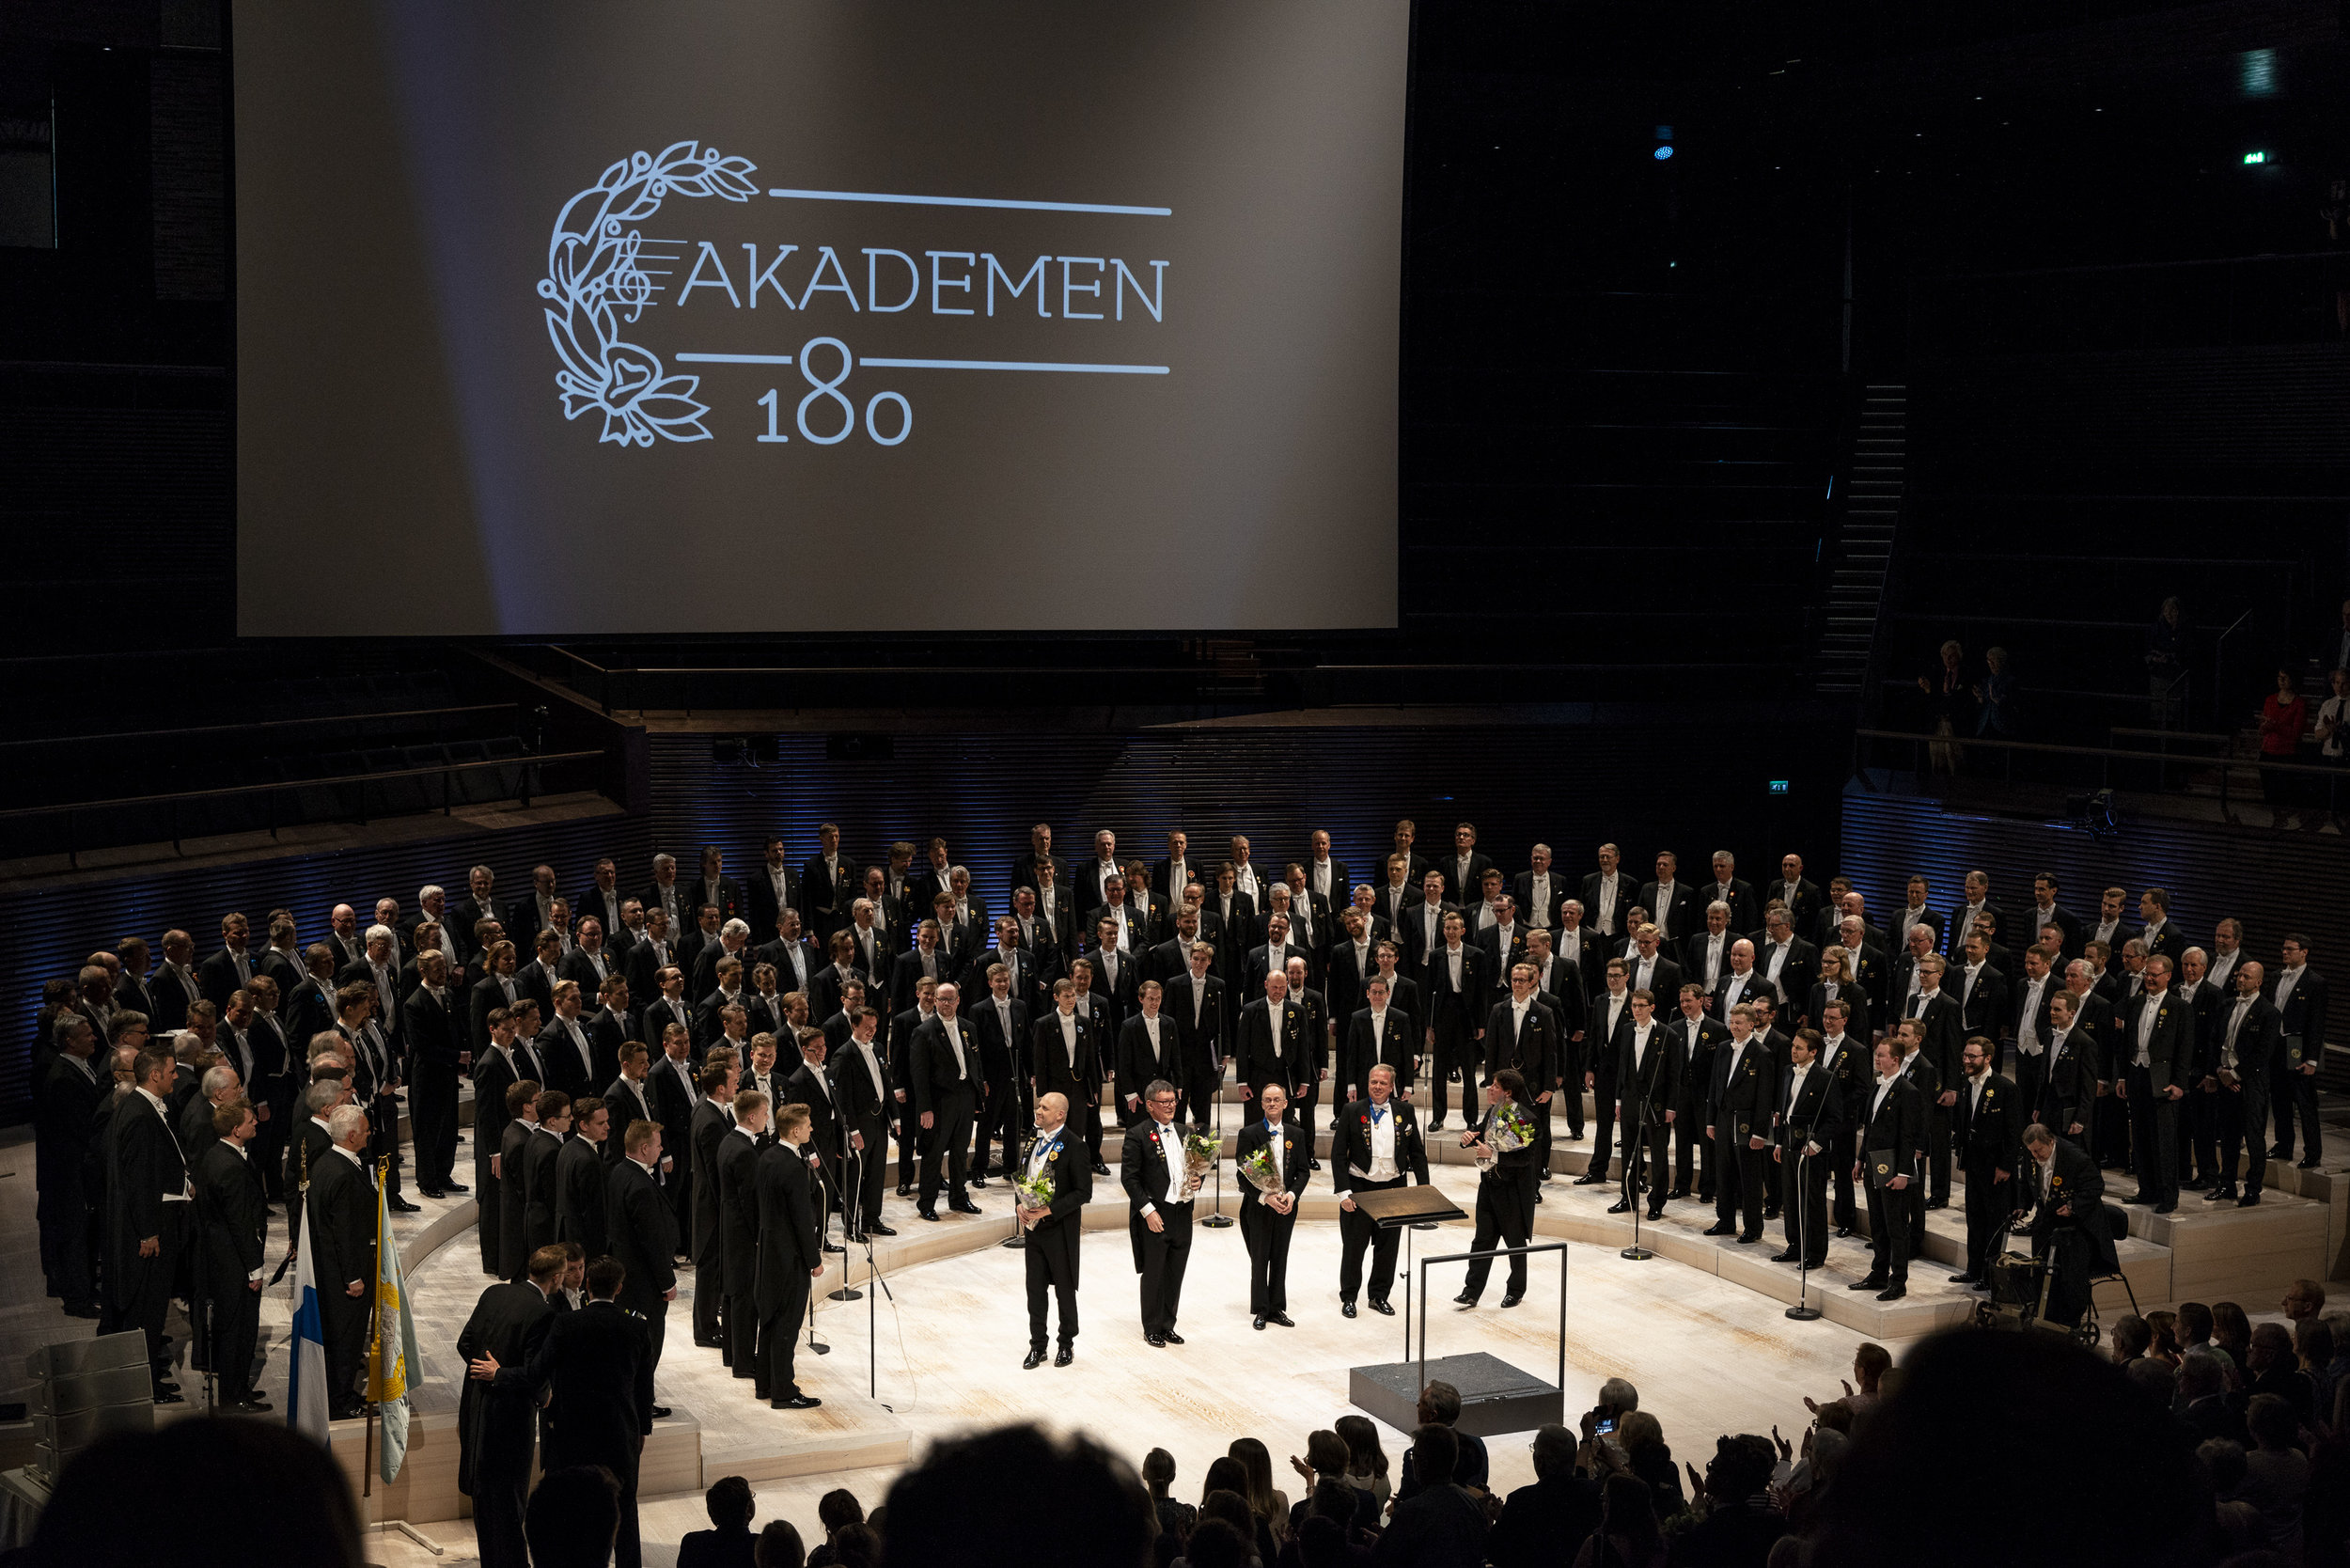 Akademen 180: Jubileumskören, Foto: Niklas Nabb